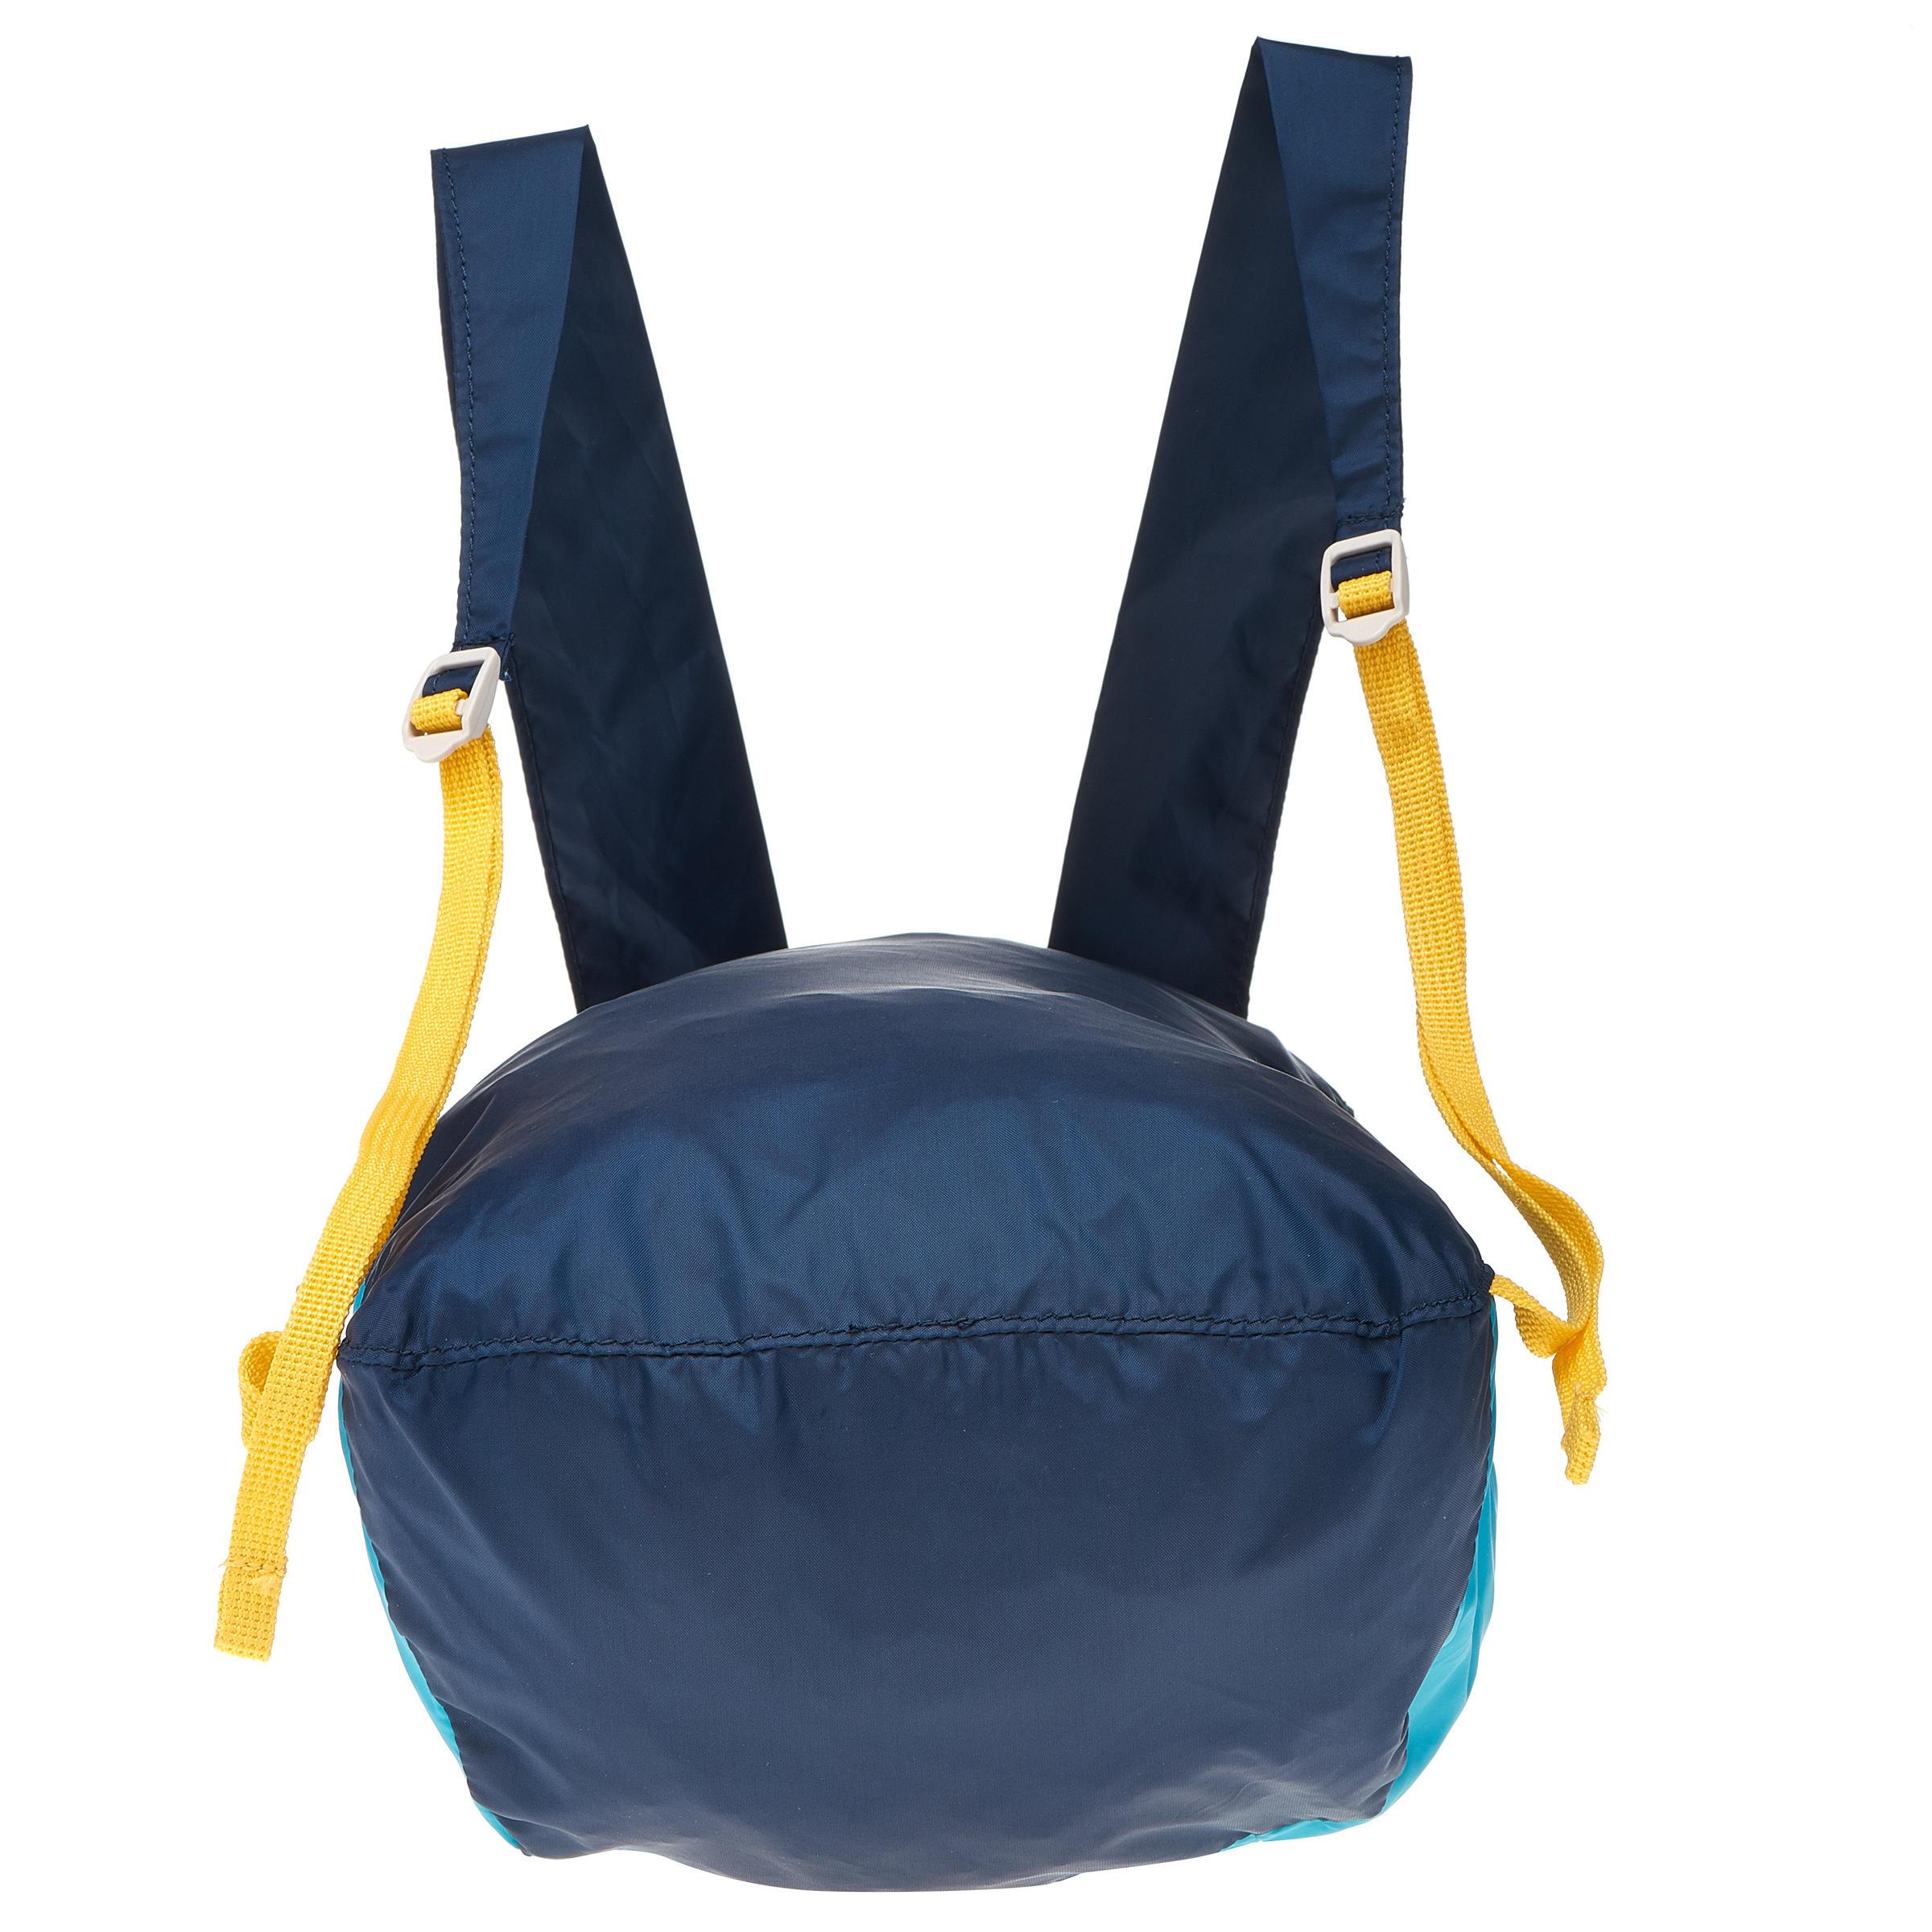 Sac à dos d'appoint ultra compact 10 litres bleu